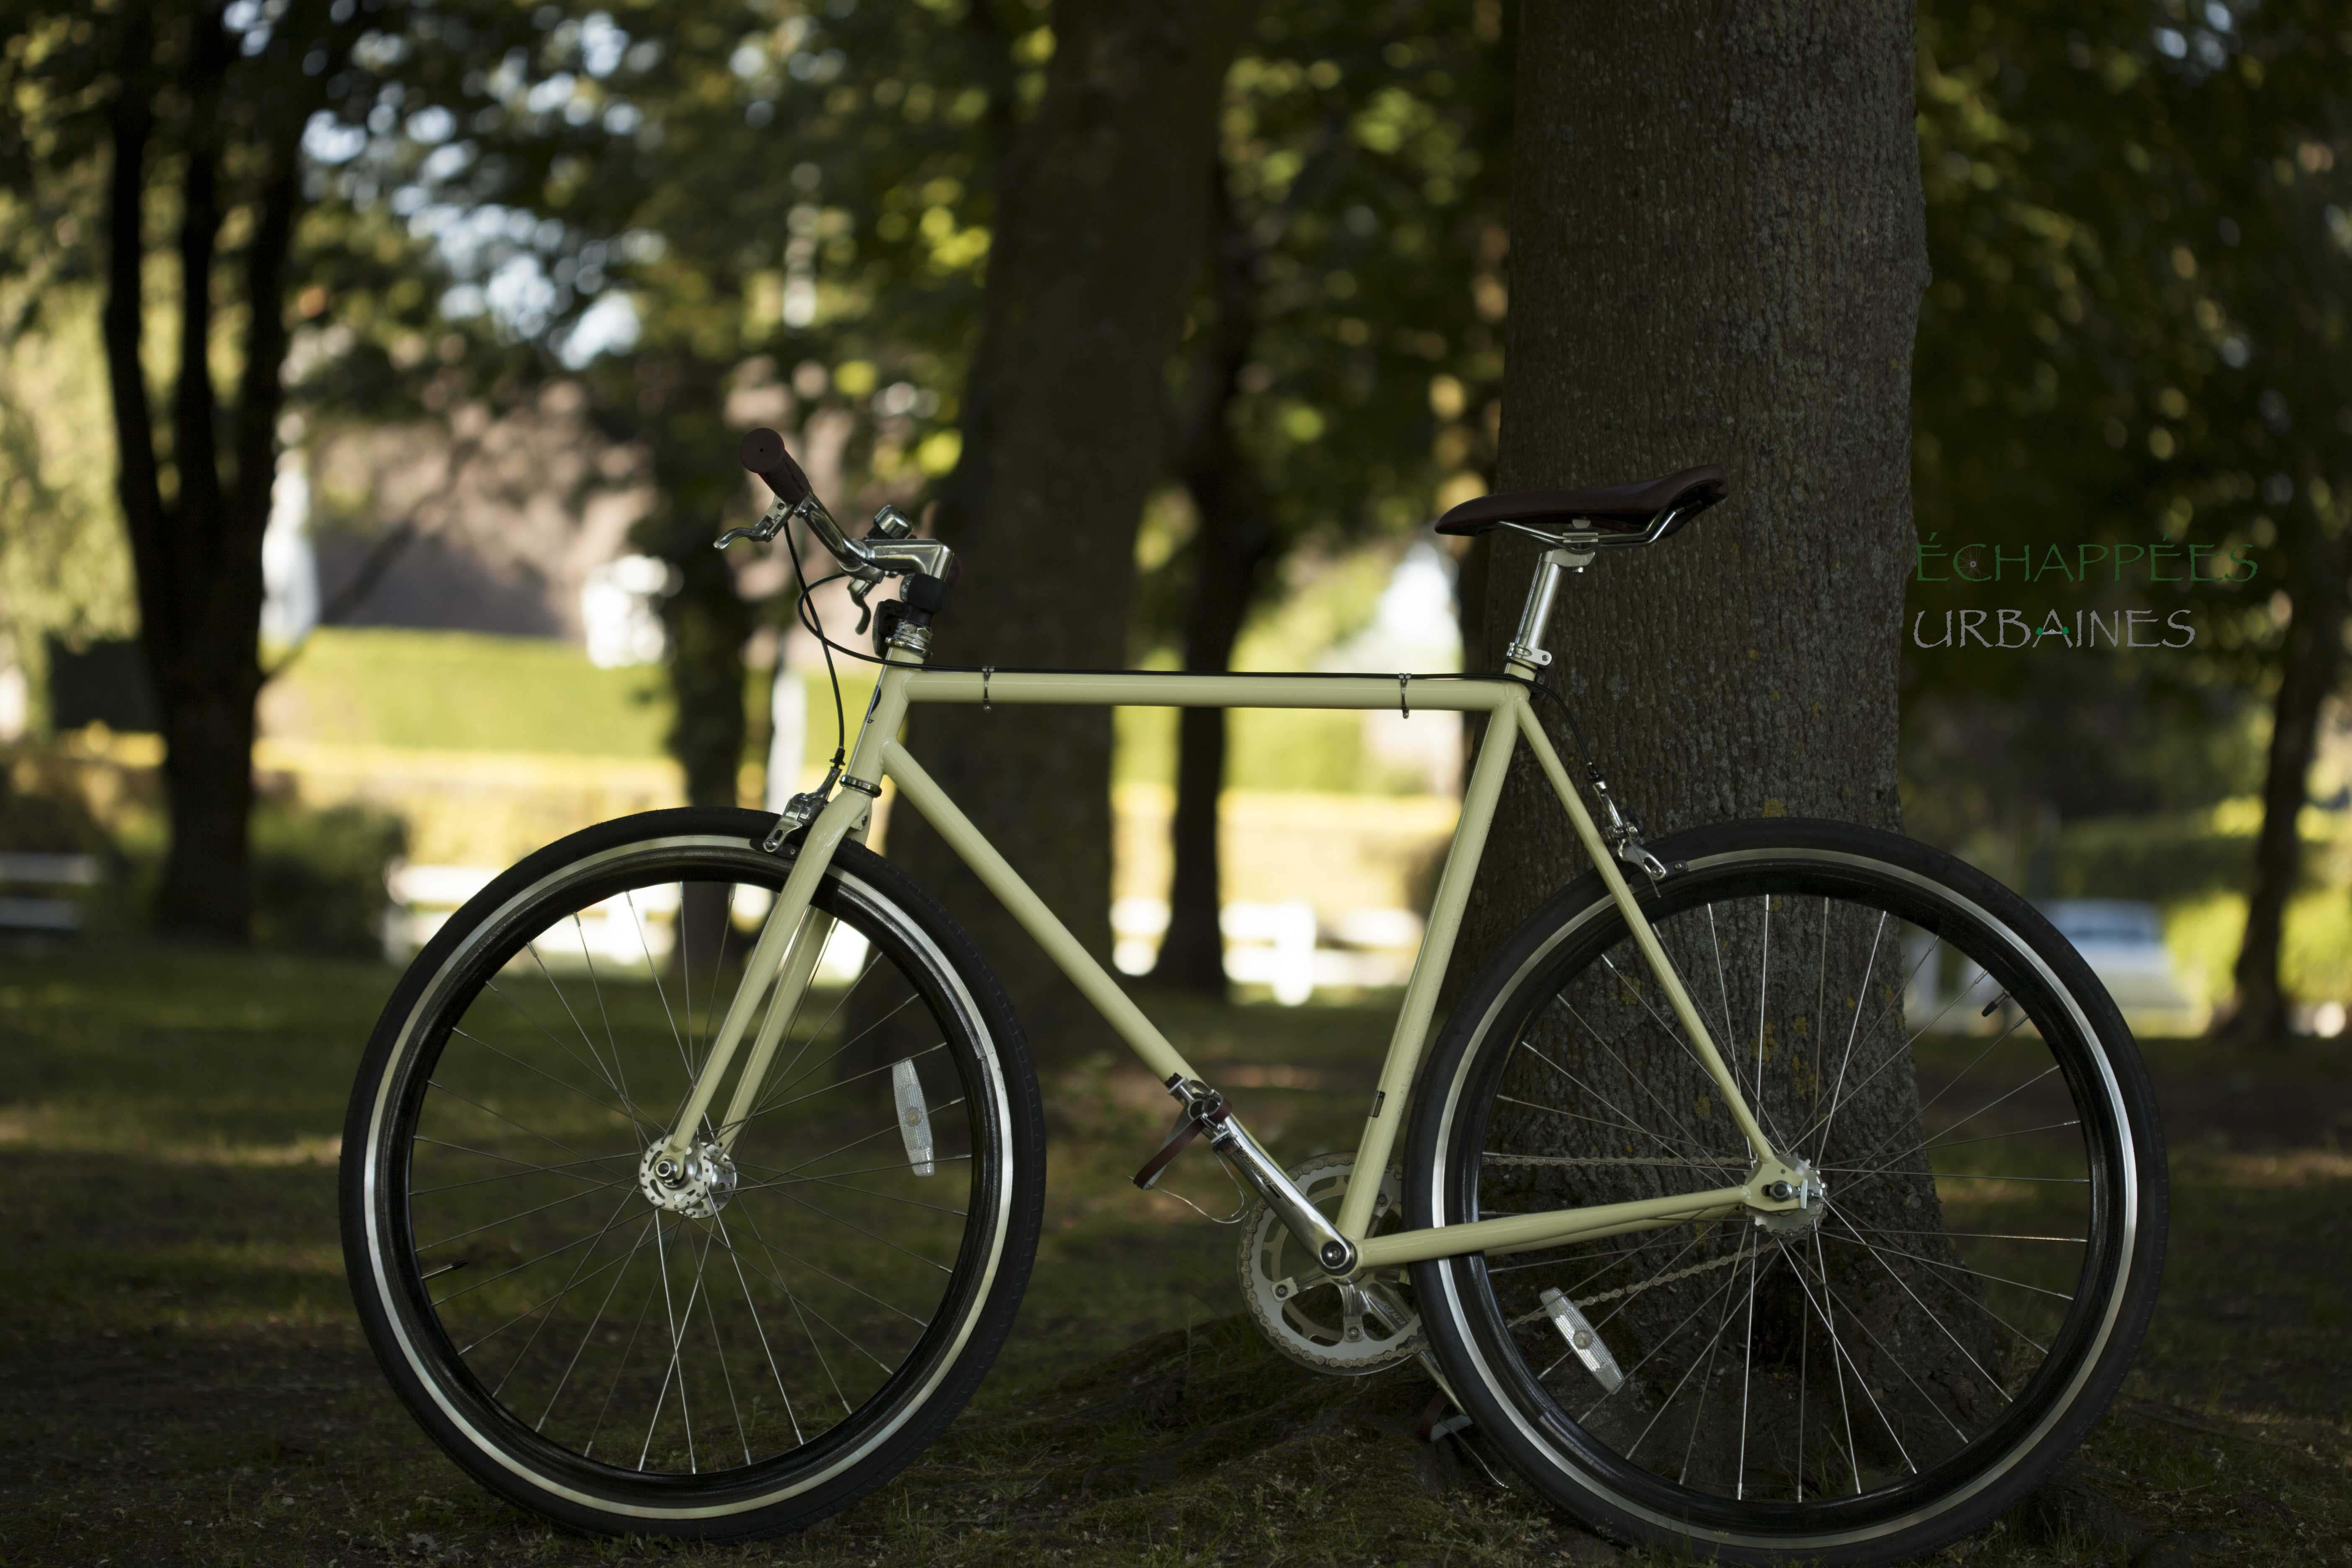 Chappelli Cycle – Fixie Crème